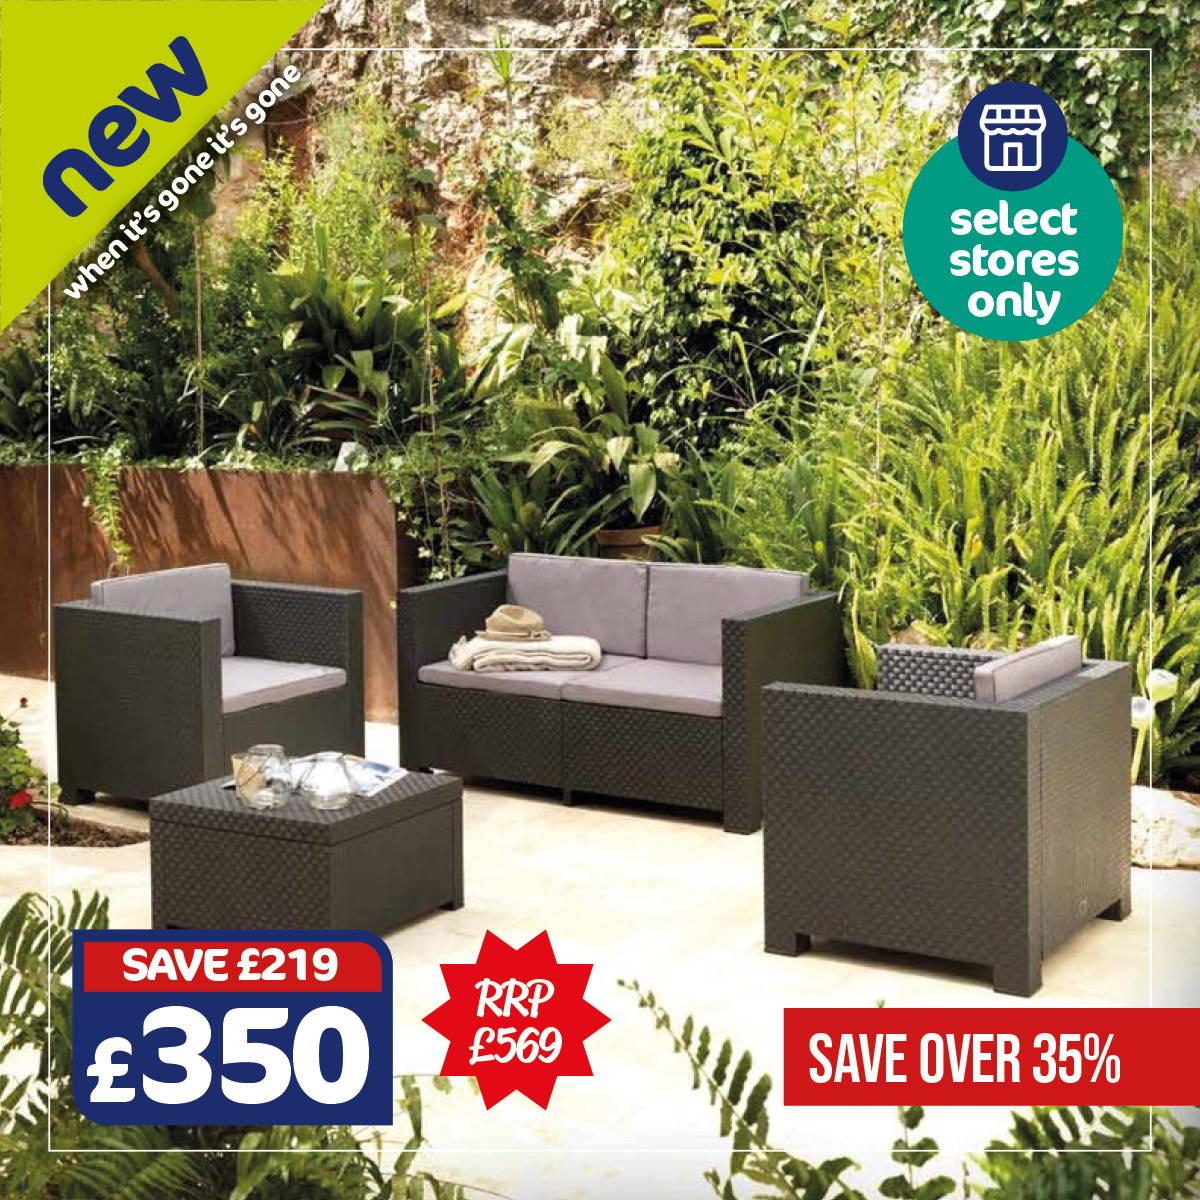 Rattan Garden Set - In Select Stores